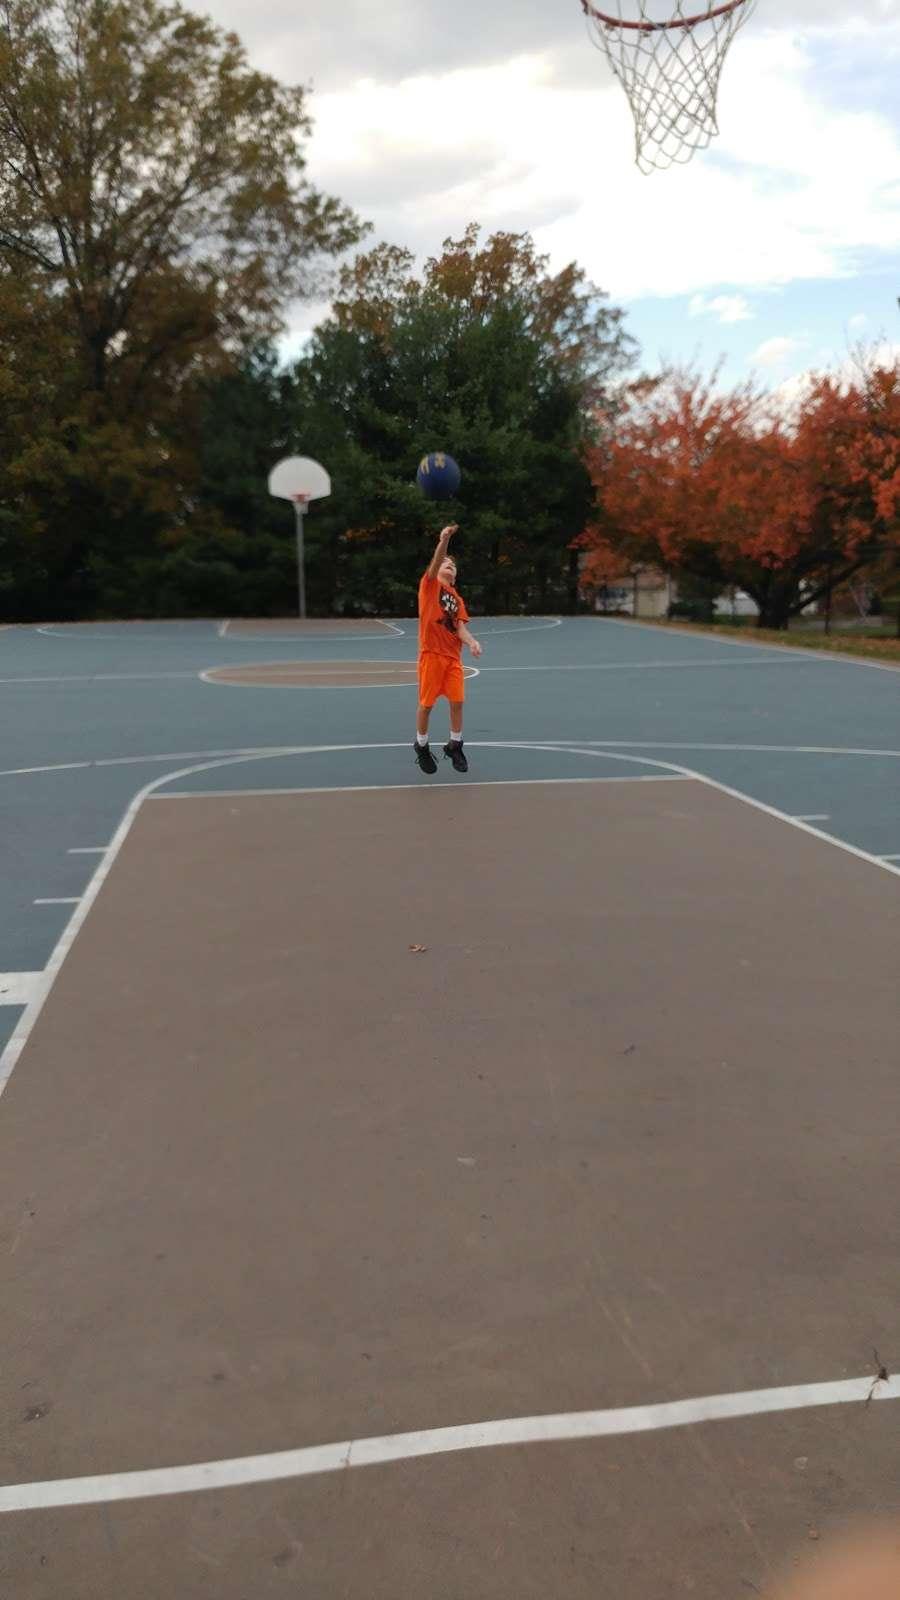 Stephen J Capestro Park - park  | Photo 10 of 10 | Address: 337 Grandview Ave, Edison, NJ 08837, USA | Phone: (732) 745-3900